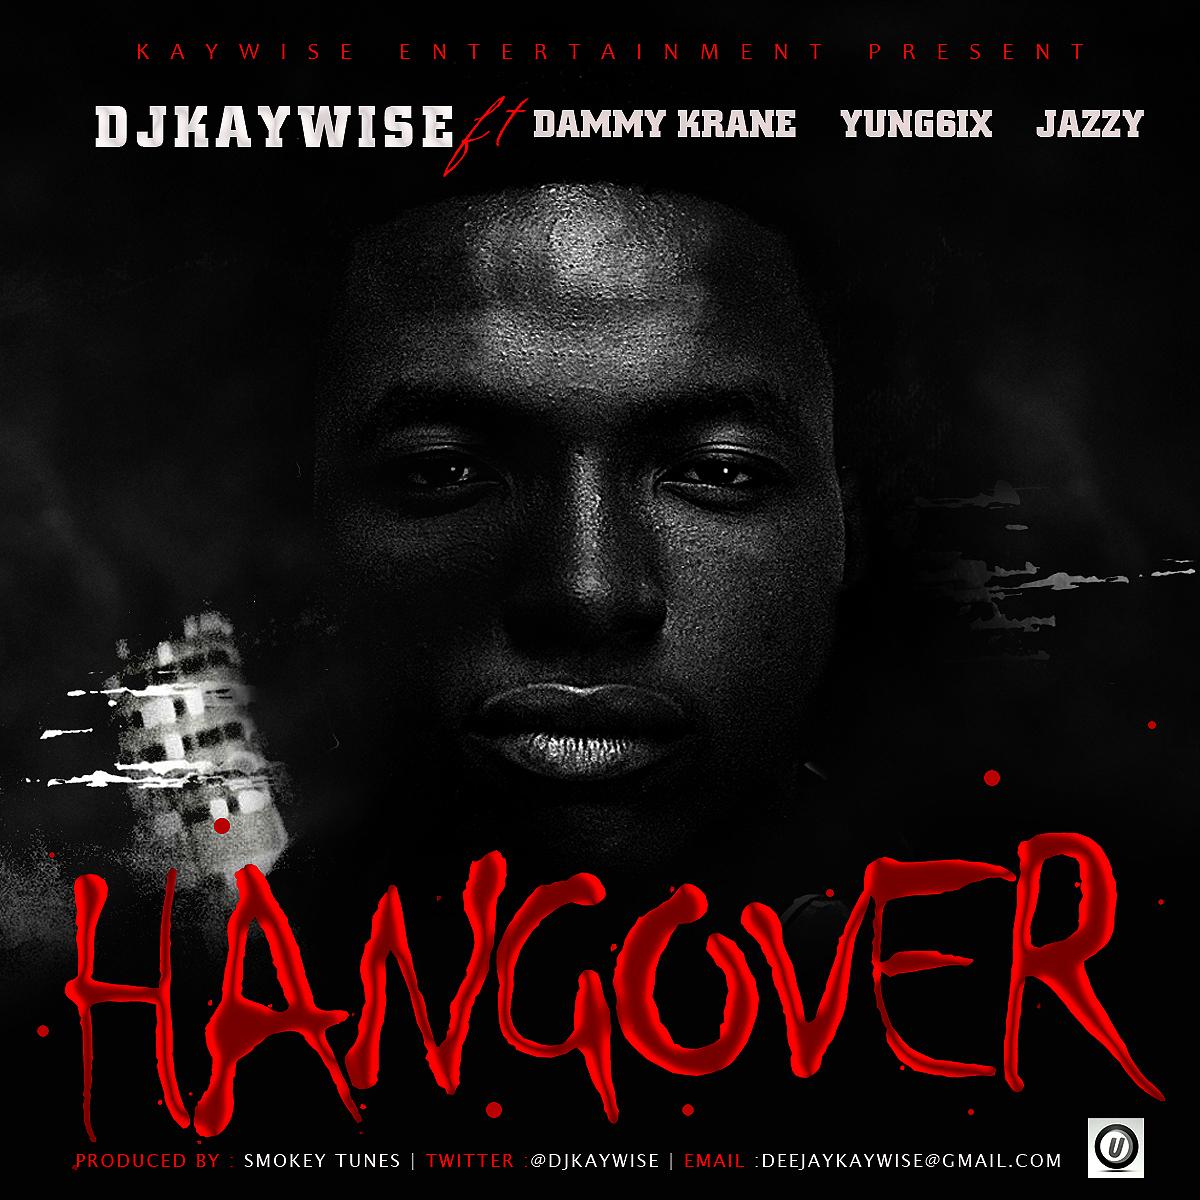 Dj Kaywise ft. Dammy Krane, Yung6ix & Jazzy - HangOver Artwork   AceWorldTeam.com